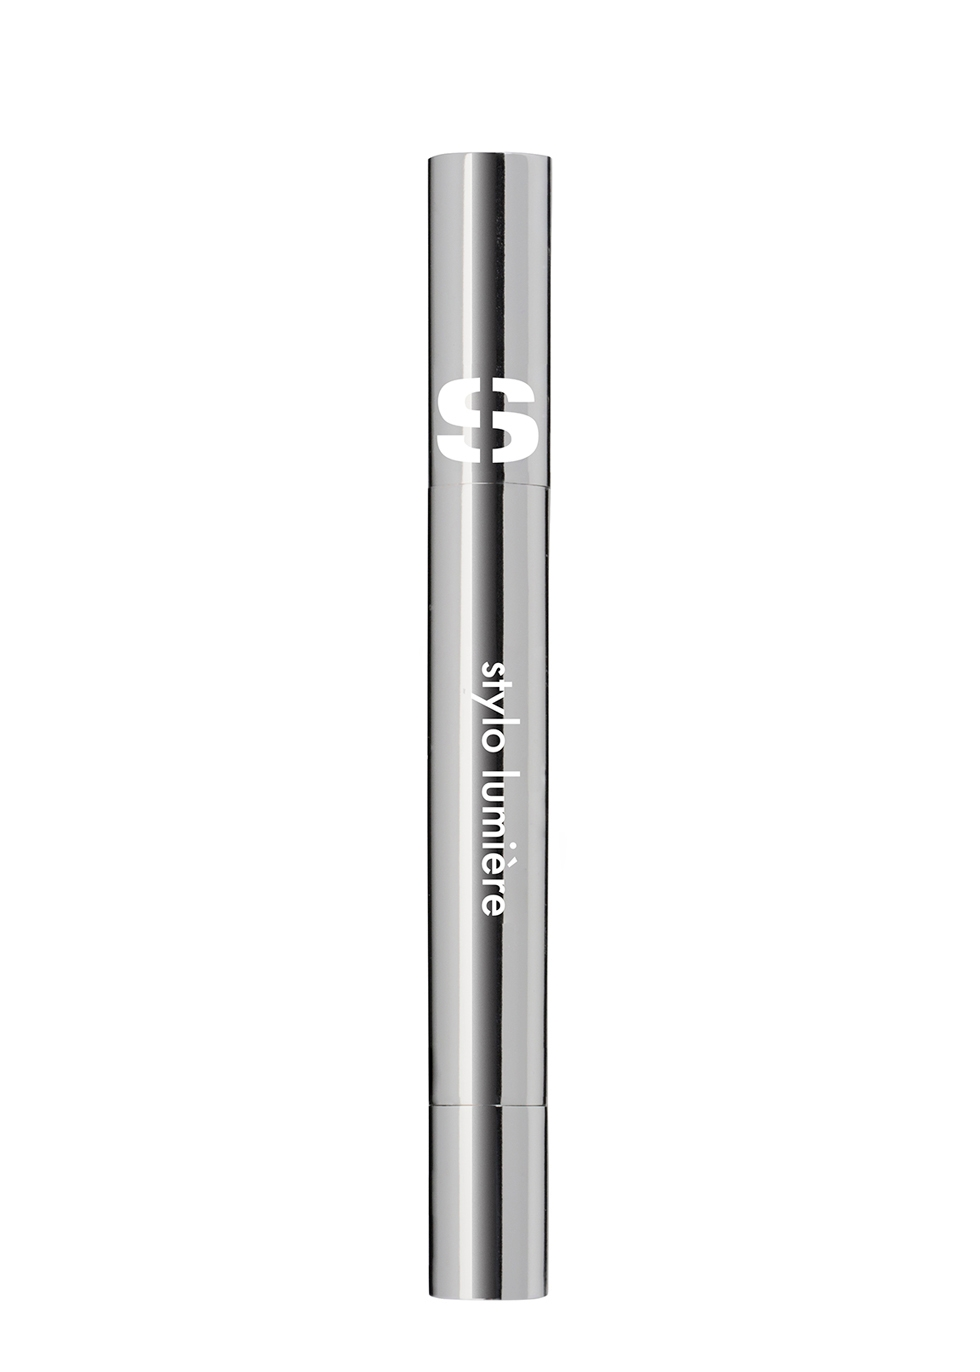 Stylo Lumière Highlighter Pen - Sisley